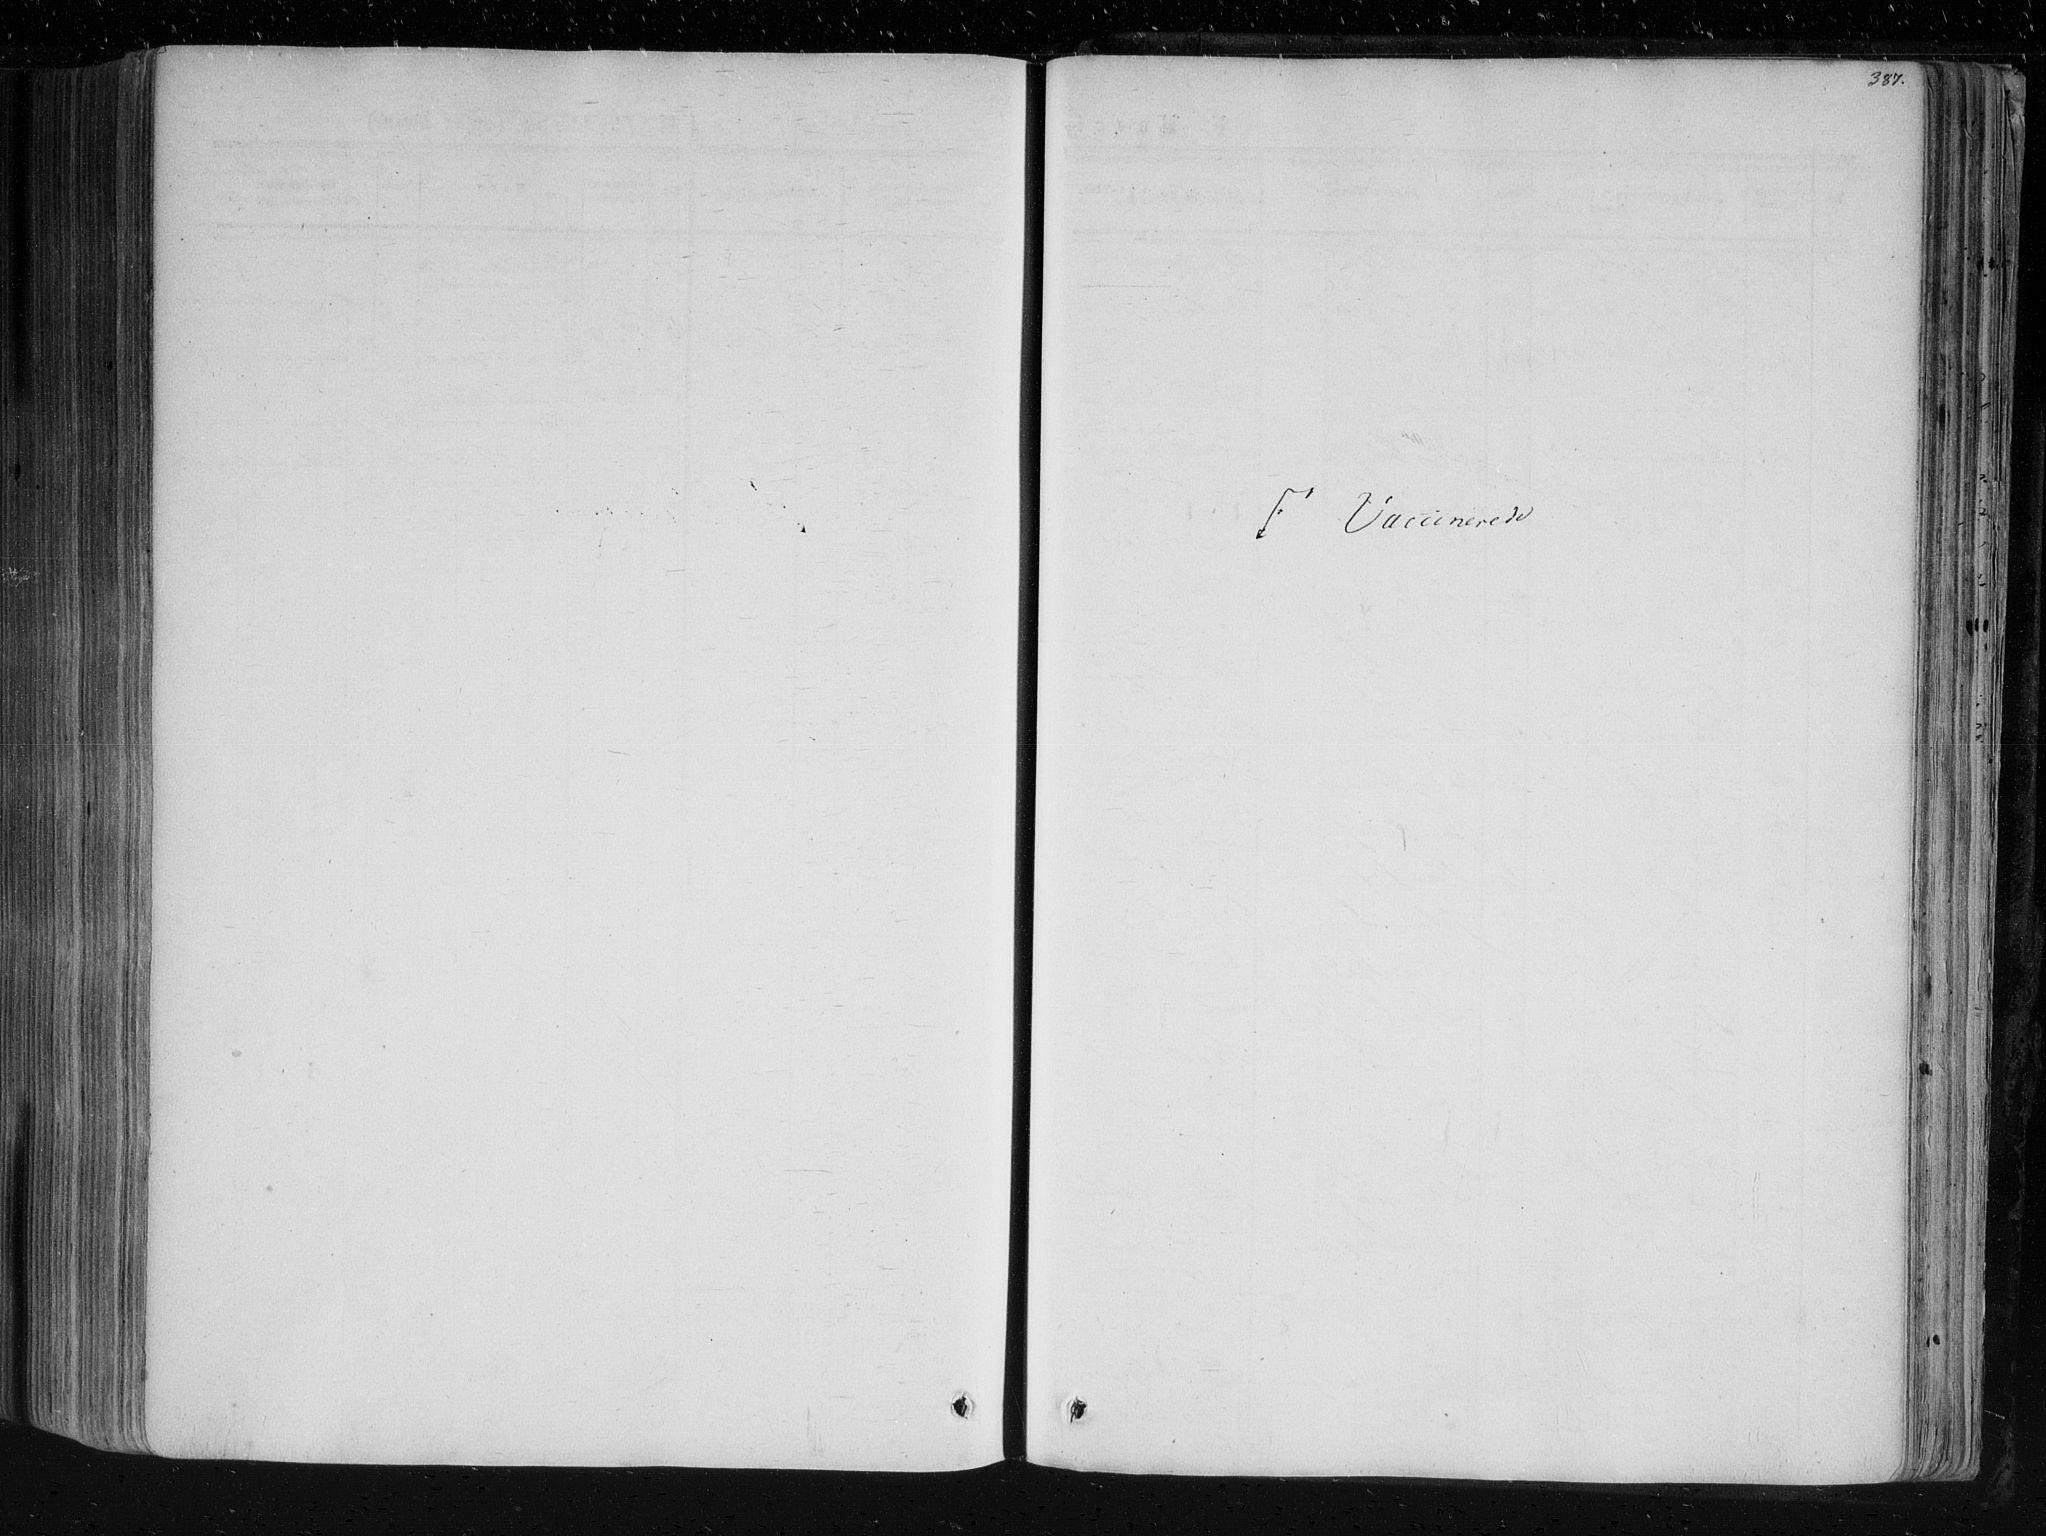 SAO, Aremark prestekontor Kirkebøker, F/Fc/L0003: Ministerialbok nr. III 3, 1850-1865, s. 387